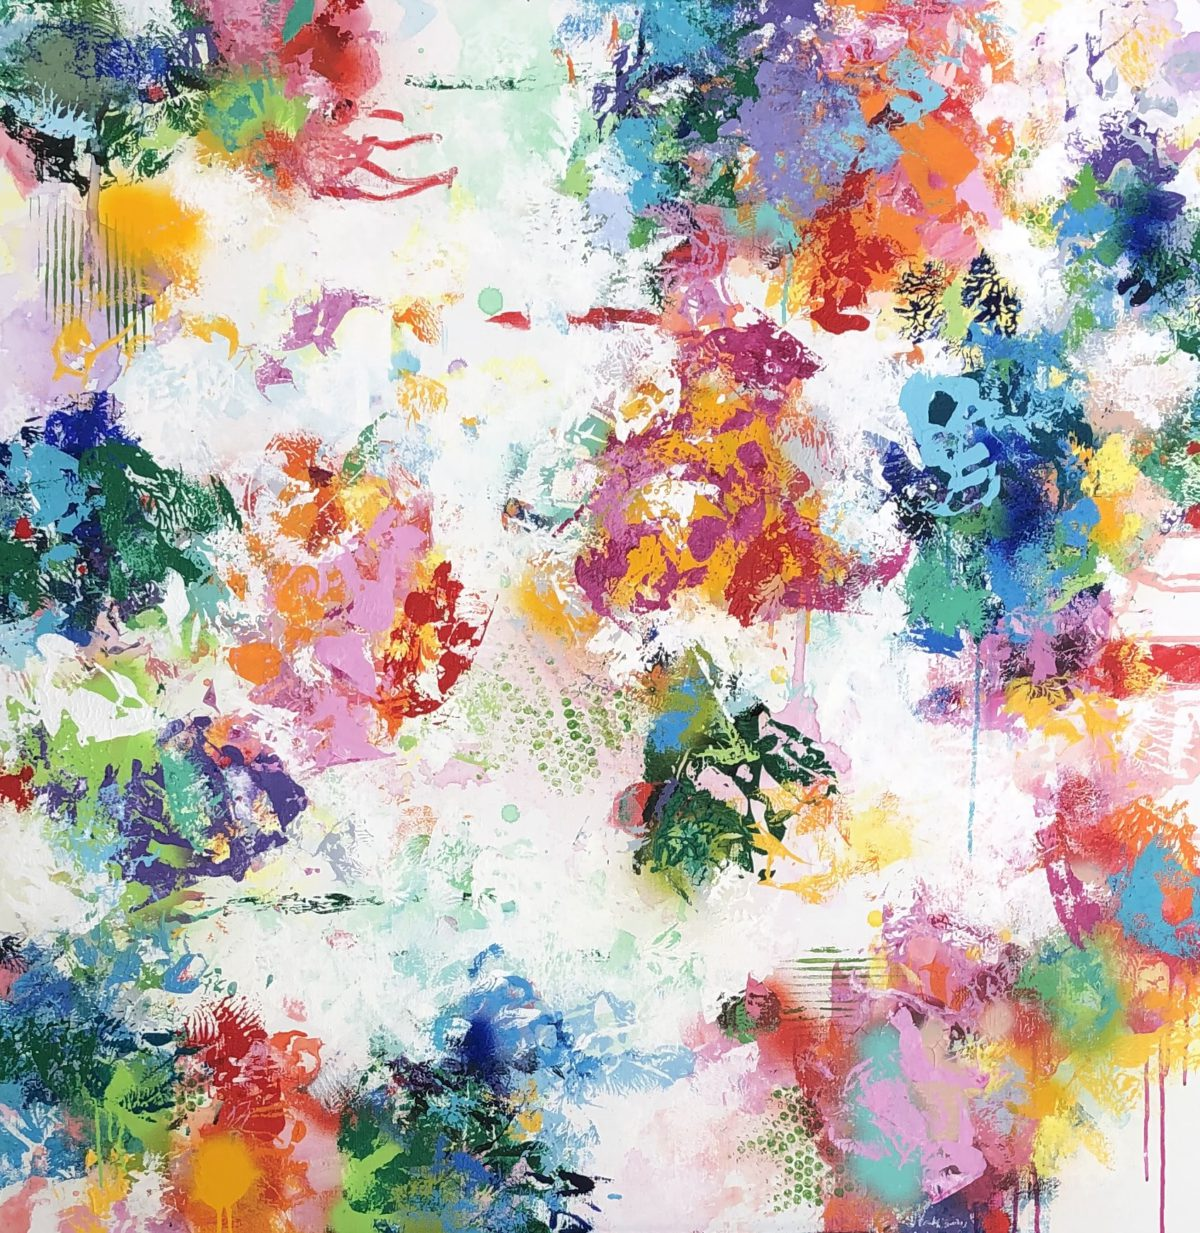 Alexandra De Grave artiste peintre painting artist